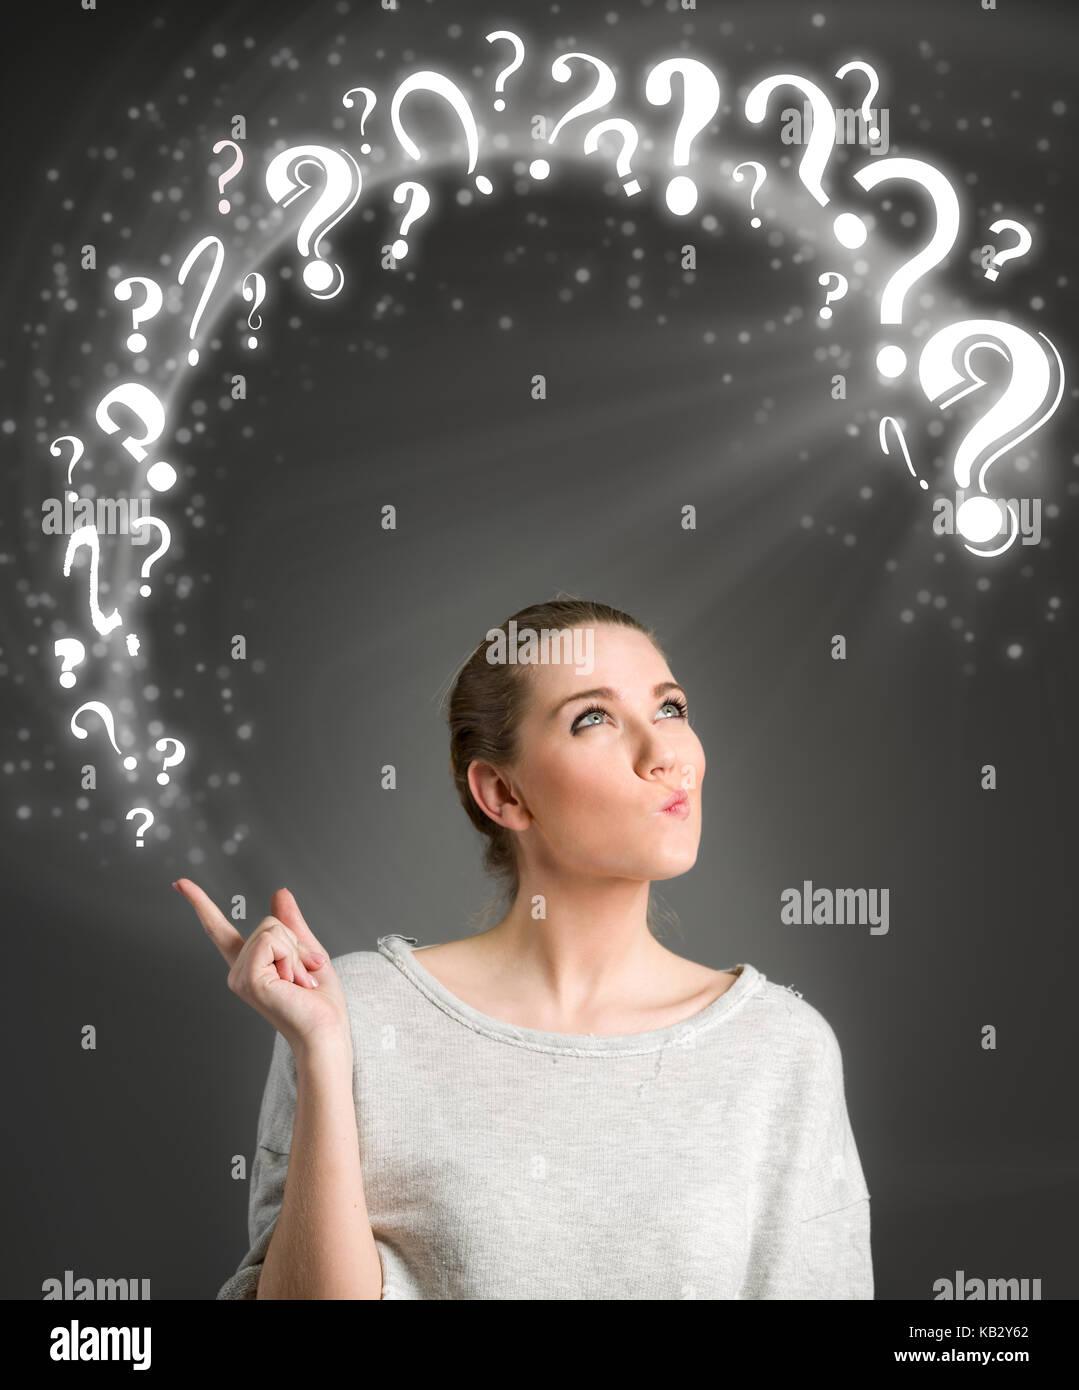 Femme penser symbole questions brillant Photo Stock